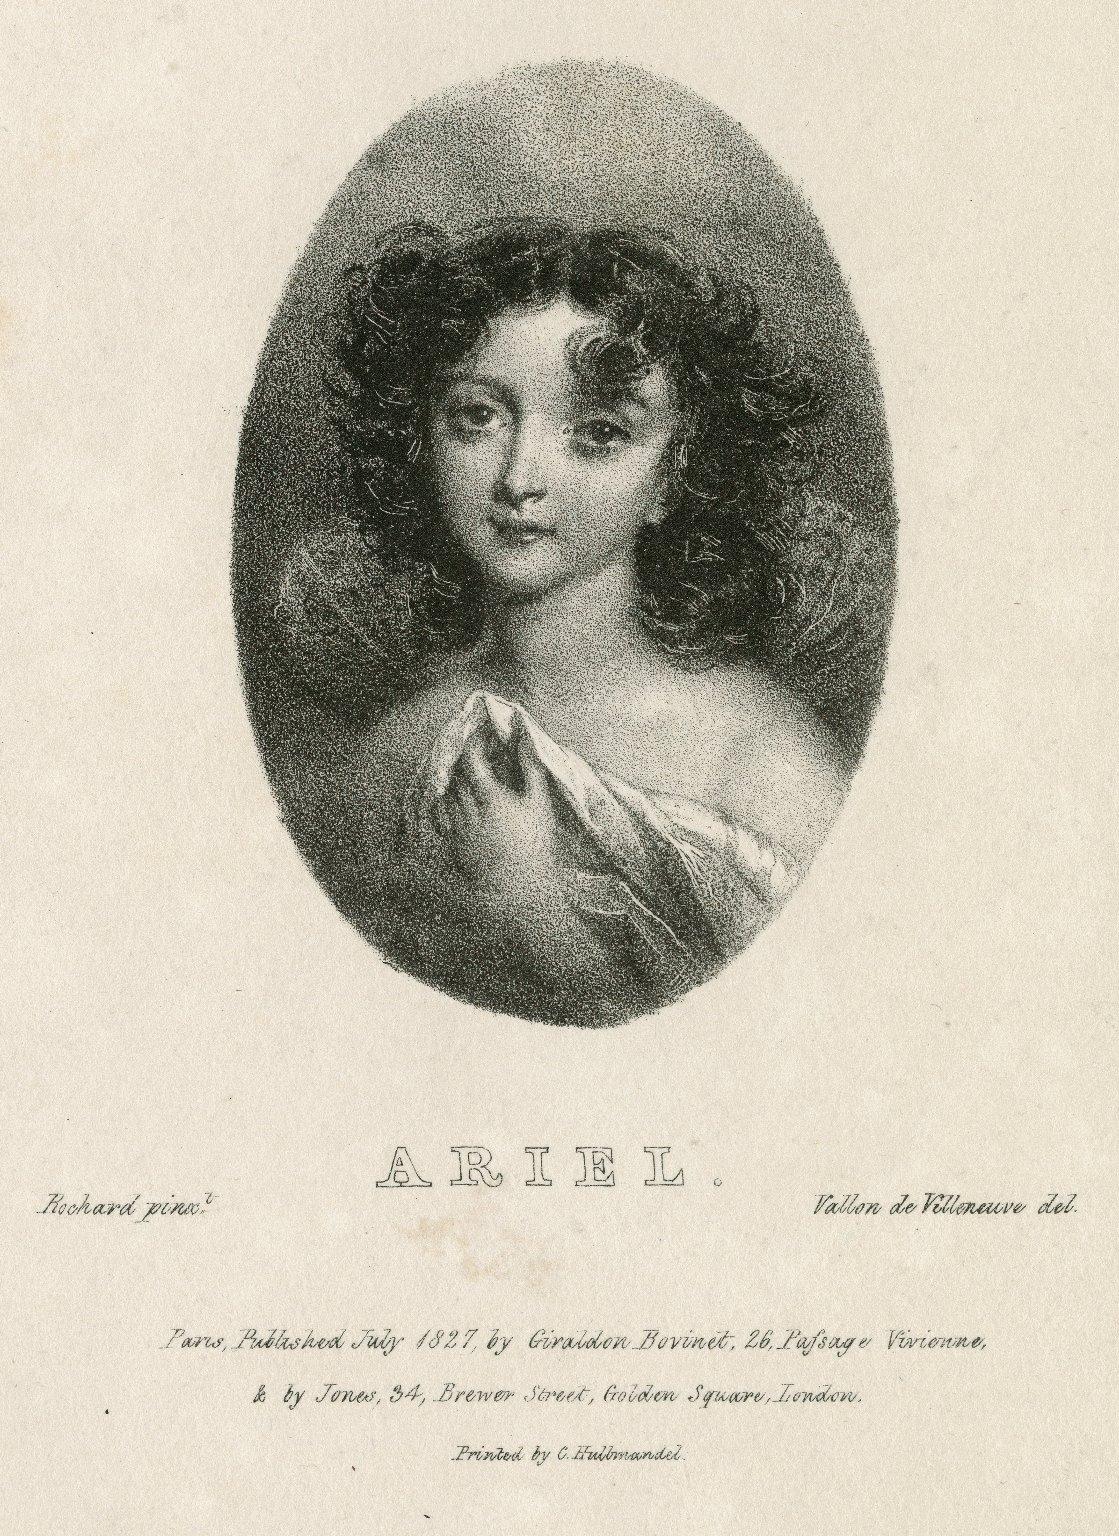 Ariel [graphic] : [character in William Shakespeare, The tempest] / Rochard, pinxt. ; Vallou de Villeneuve, del.